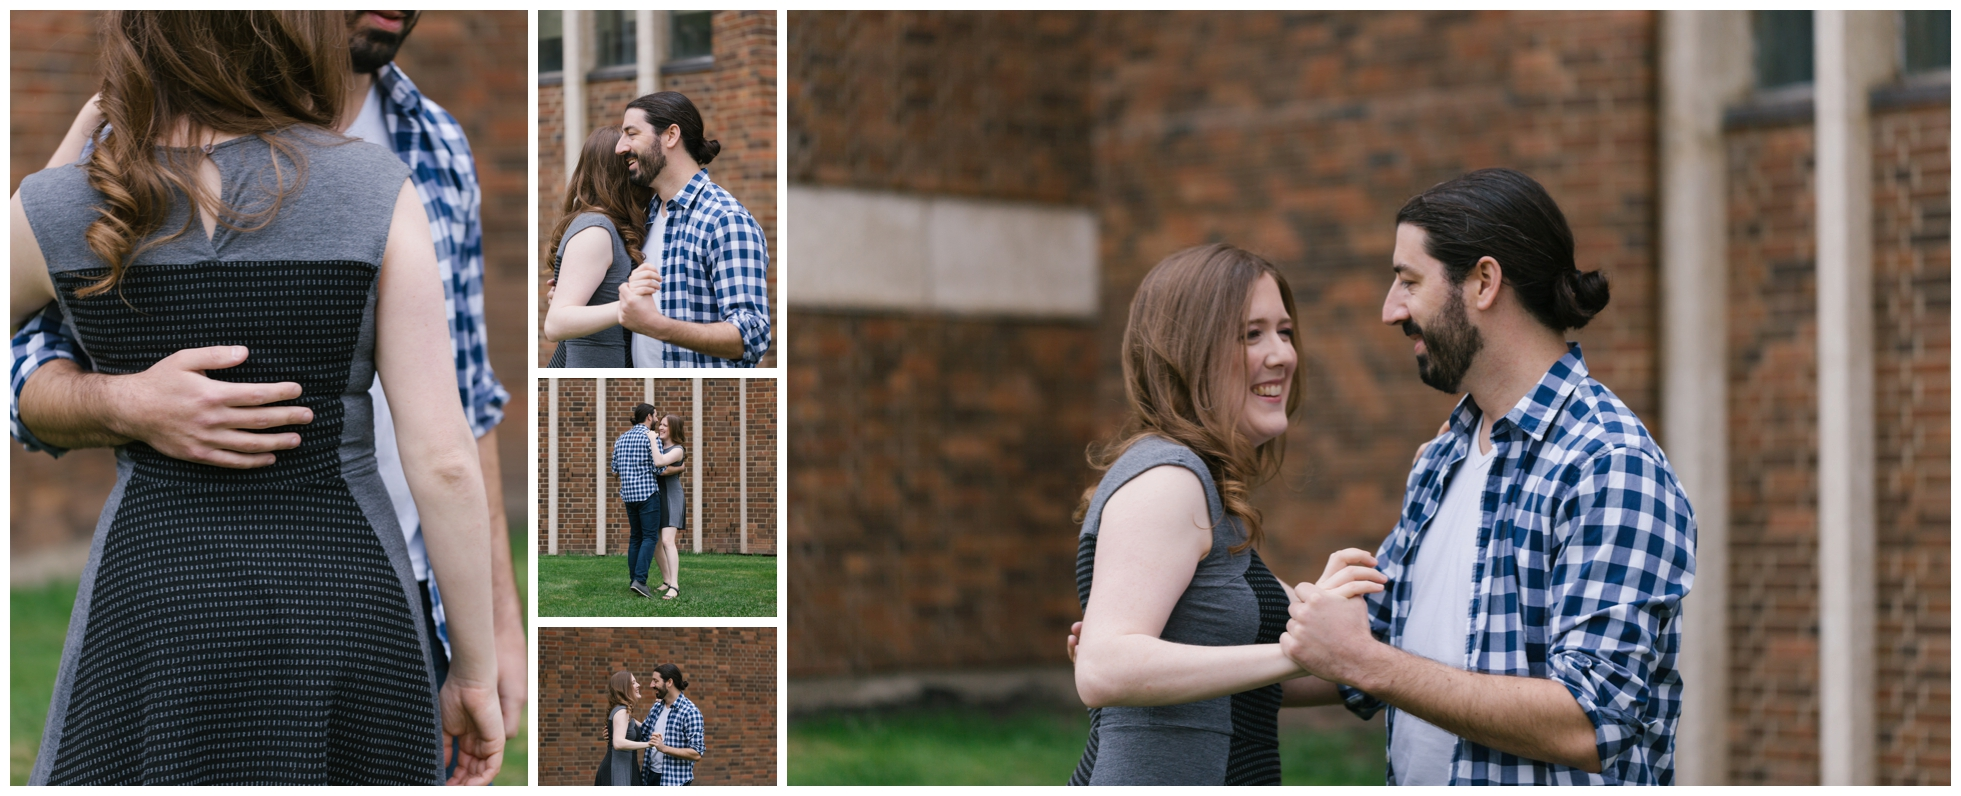 Kate and Jordan Edmonton Engagement Session (Life by Selena Photography)_0003.jpg